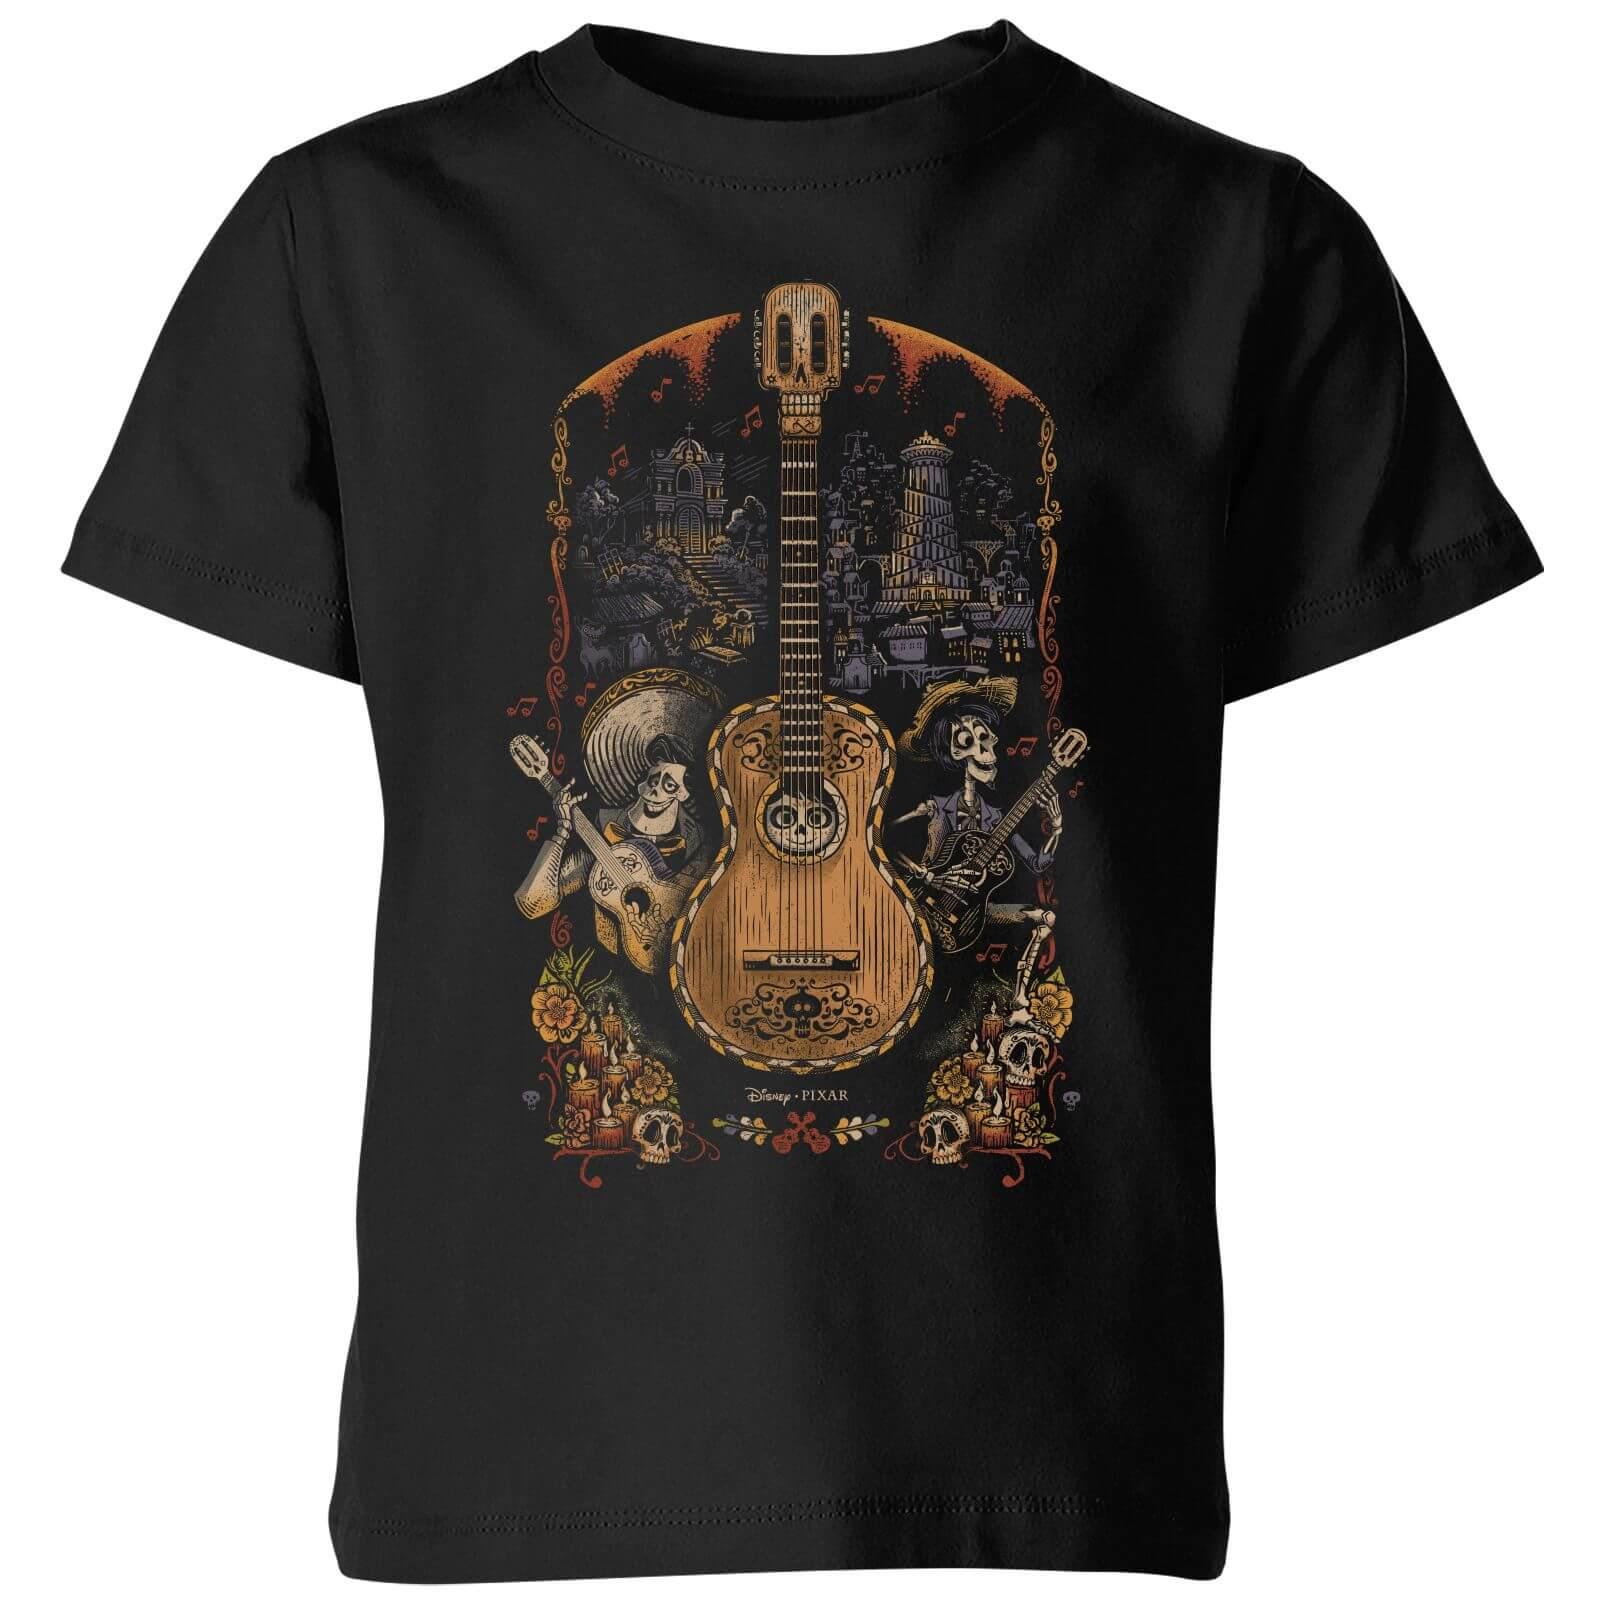 Disney Coco Guitar Poster Kids' T-Shirt - Black - 7-8 Years - Black